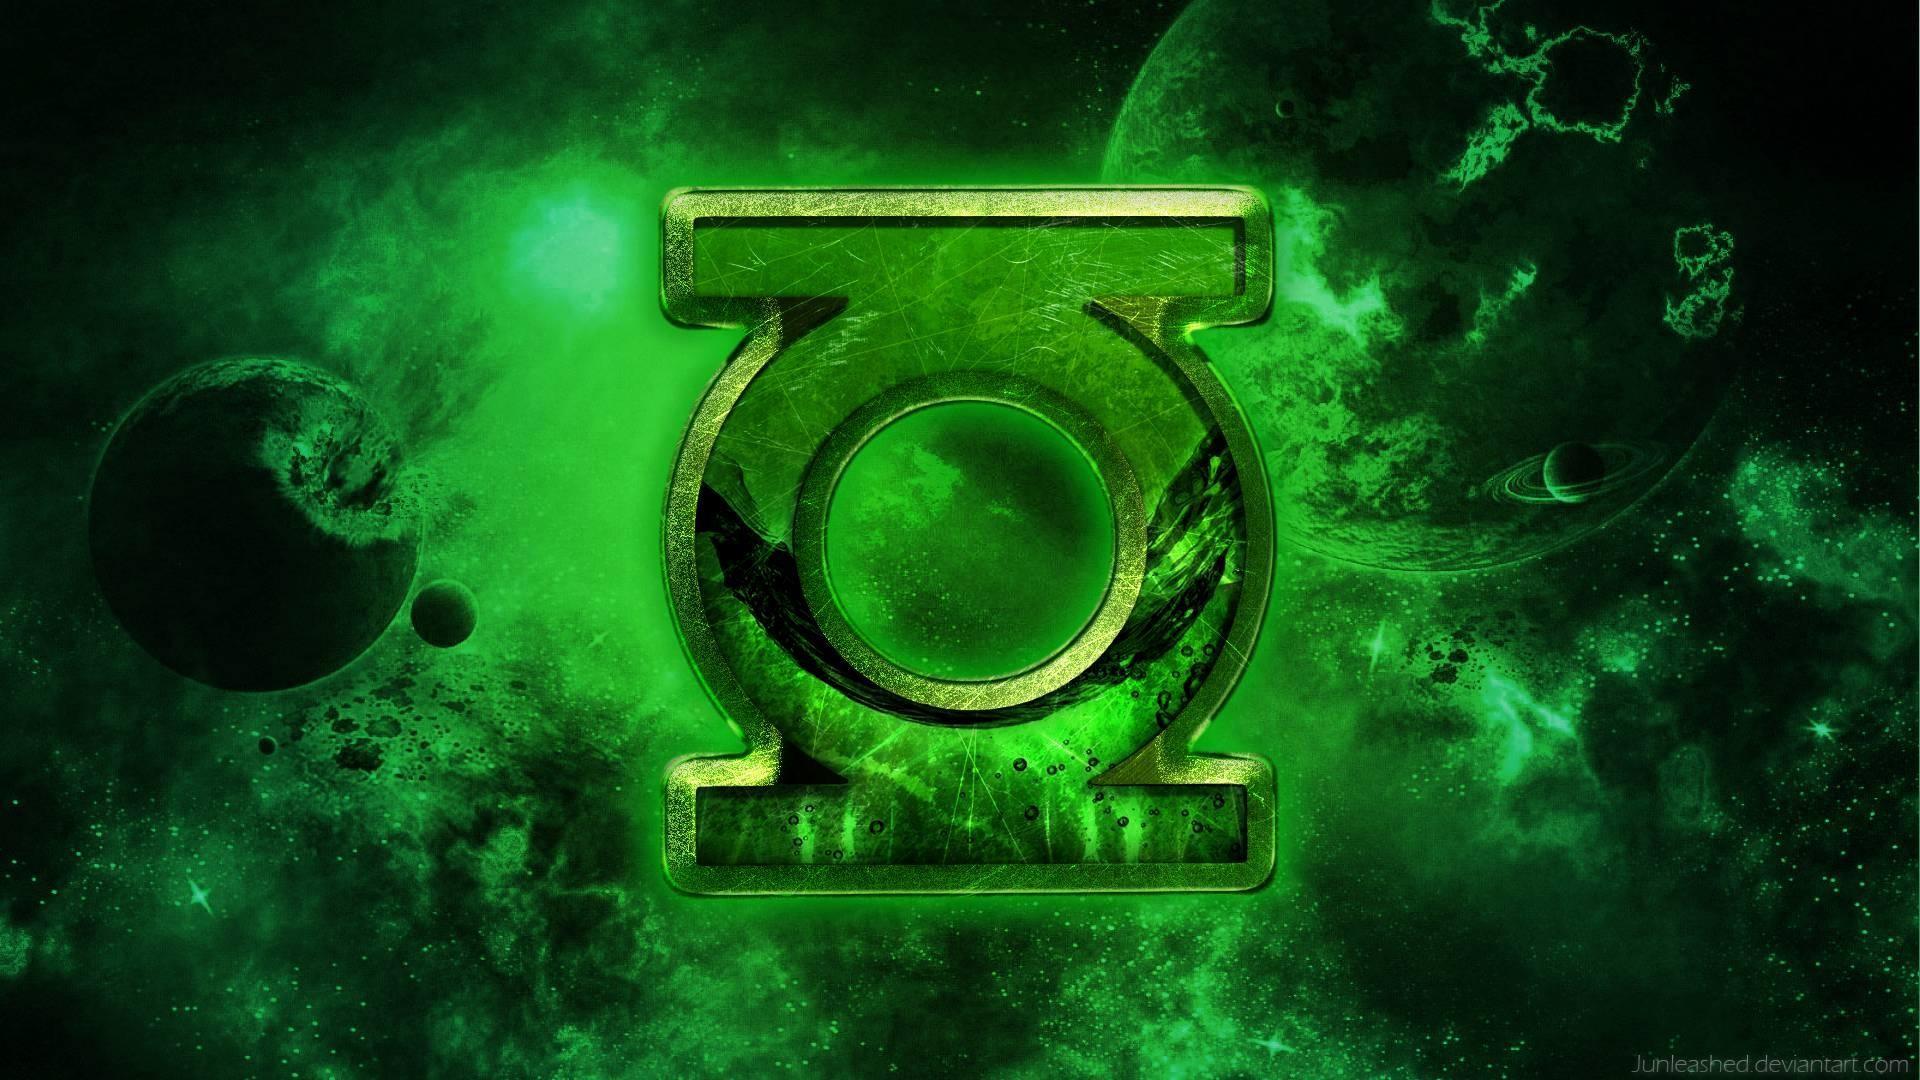 Green-Lantern-HD-Backgrounds-wallpaper-wp4007302